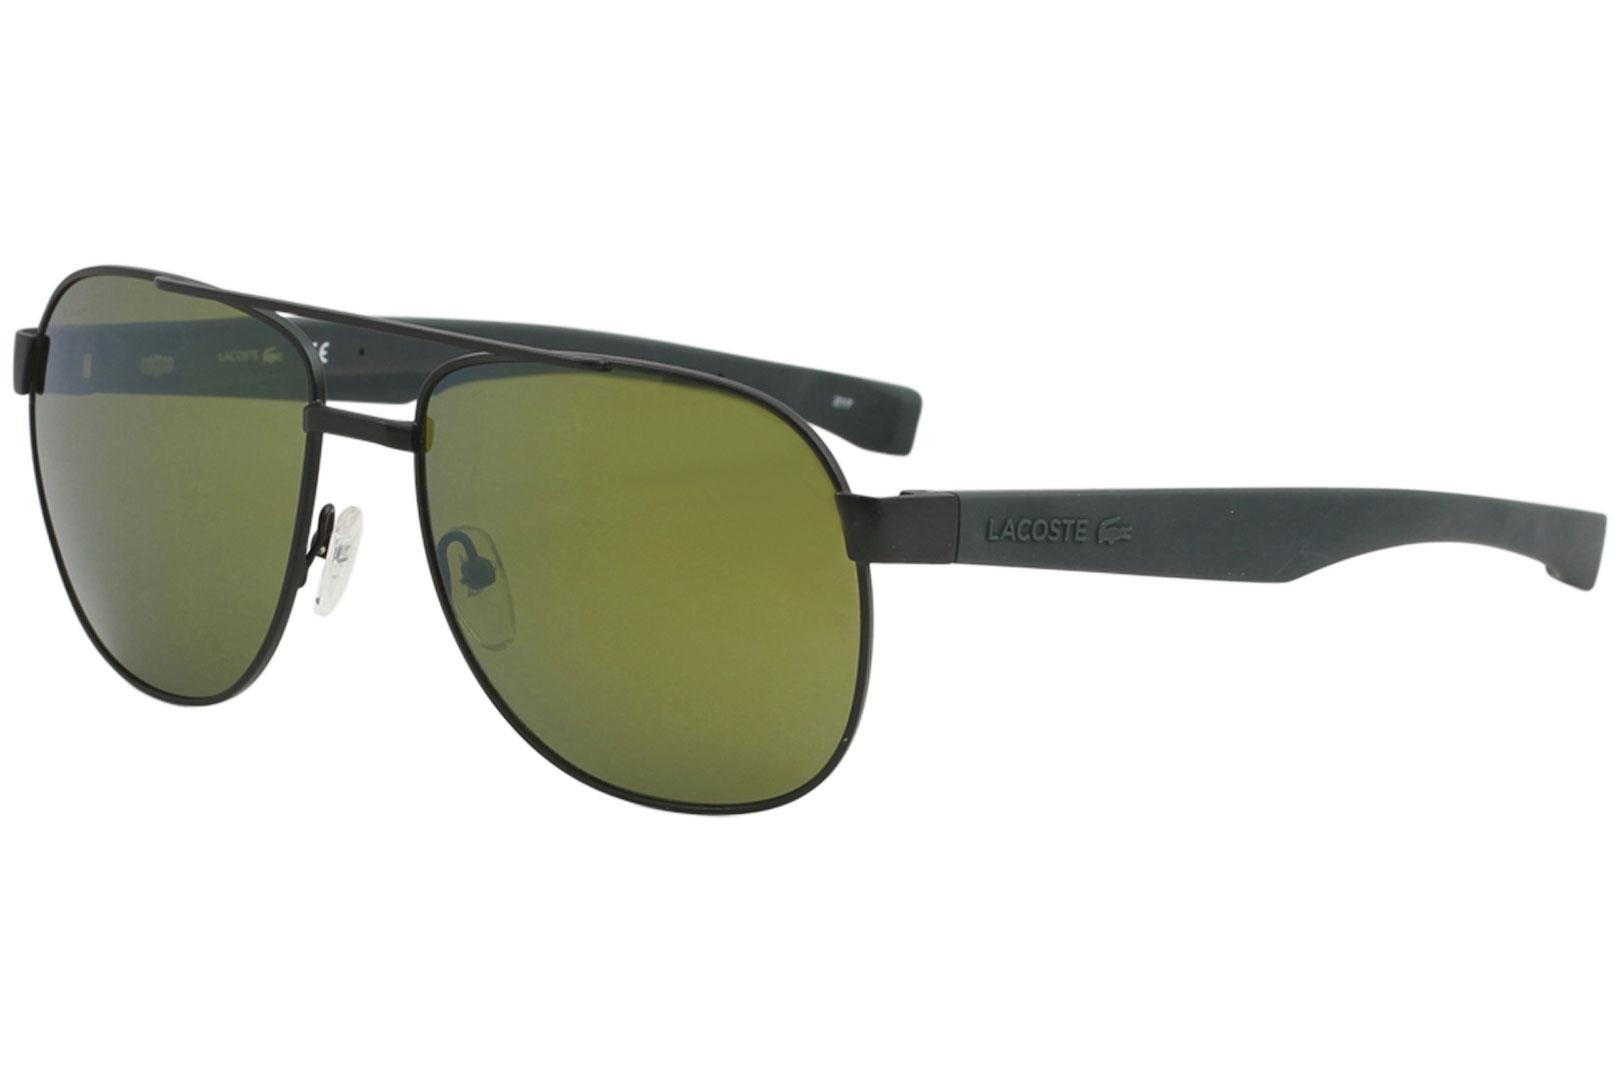 d4b720a9b20 Lacoste Men s L186S L 186 S 315 Matte Green Fashion Pilot Sunglasses ...